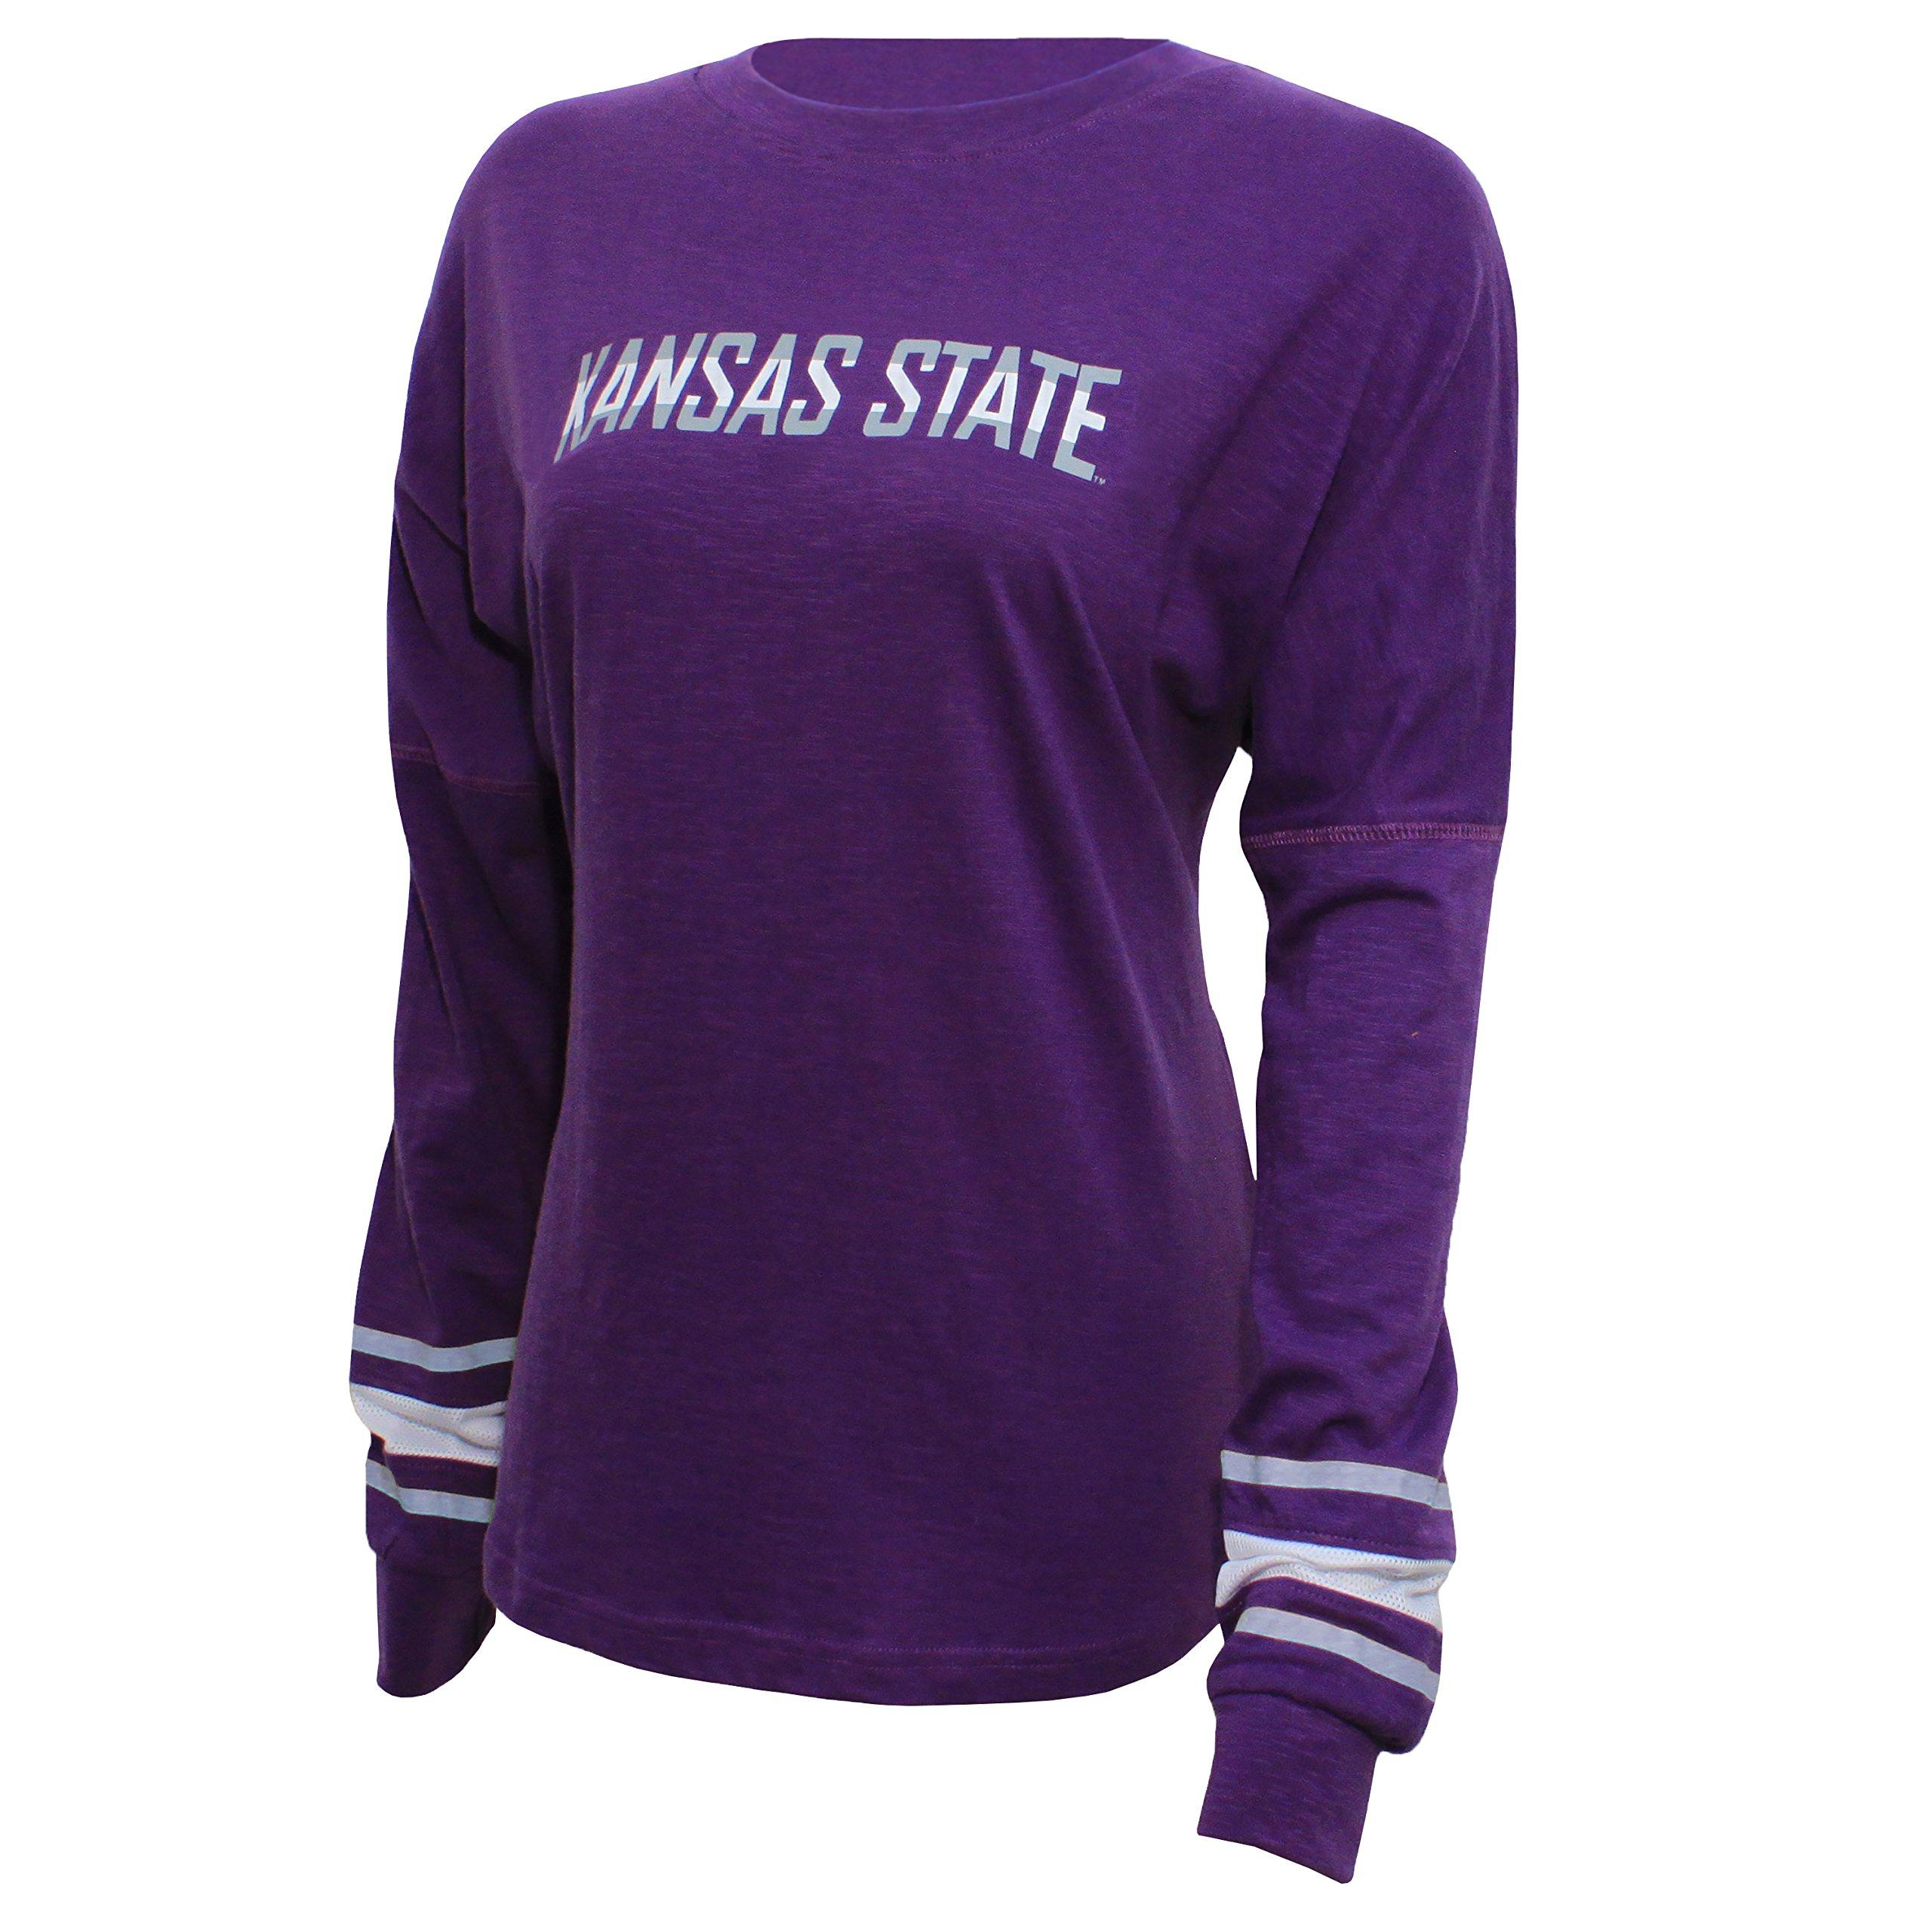 NCAA Kansas State Wildcats Women's Campus Specialties Long Sleeve Fan Tee, Large, Purple